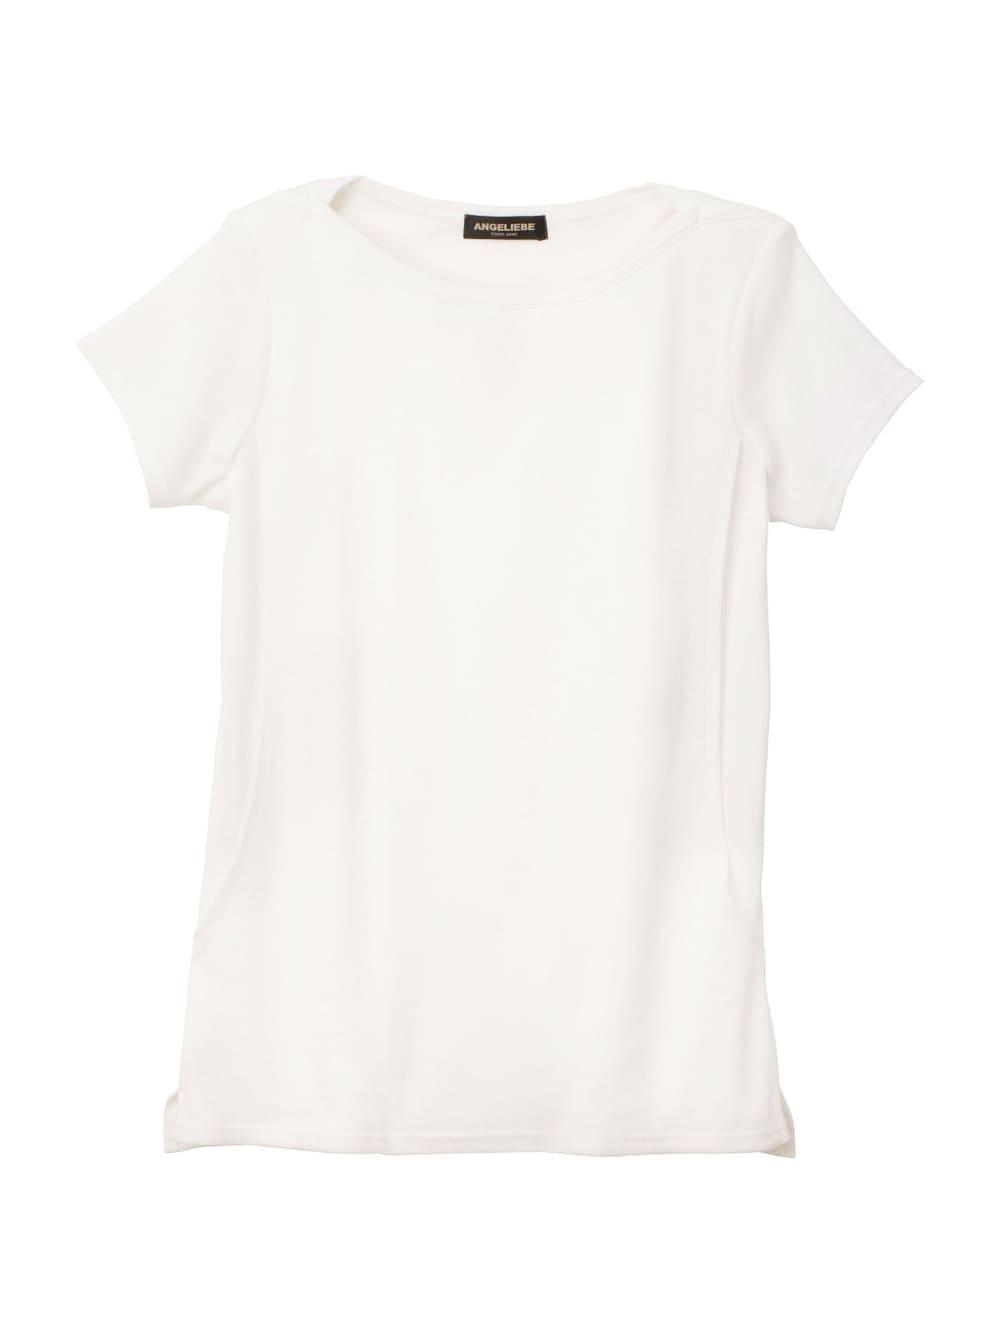 【ANGELIEBE/エンジェリーベ】 【産後授乳服】綿混やわらかフライス半袖ボートネックTシャツ オフ フリー